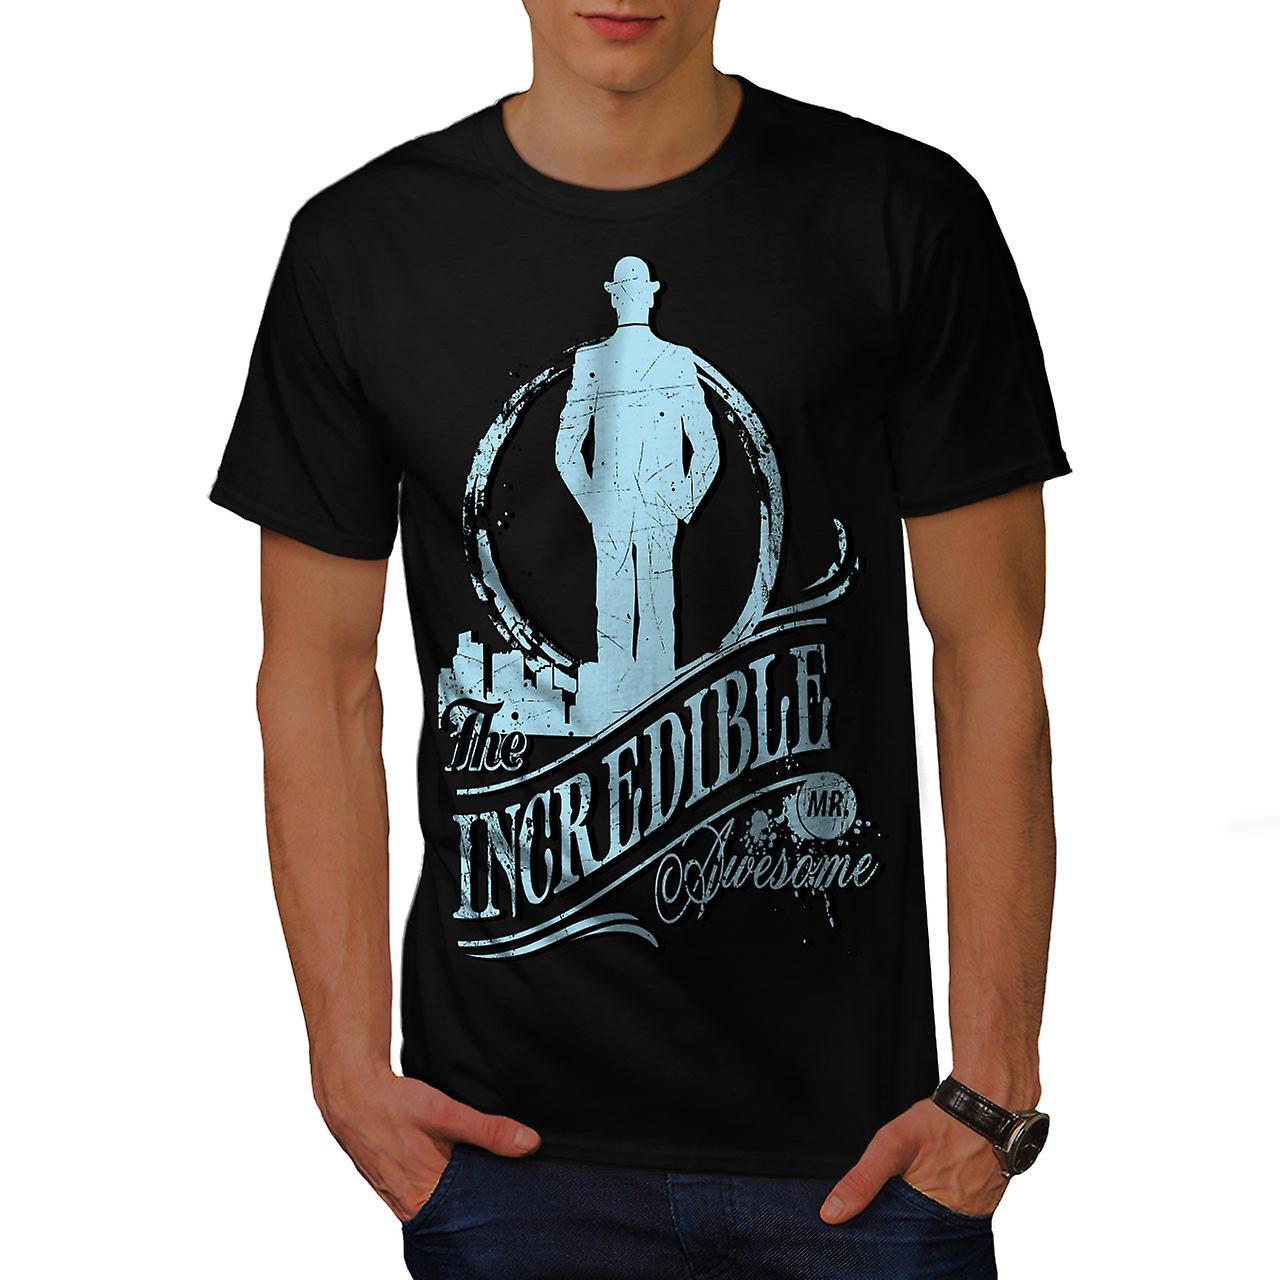 Incredible Awesome Slogan Men Black T-shirt | Wellcoda